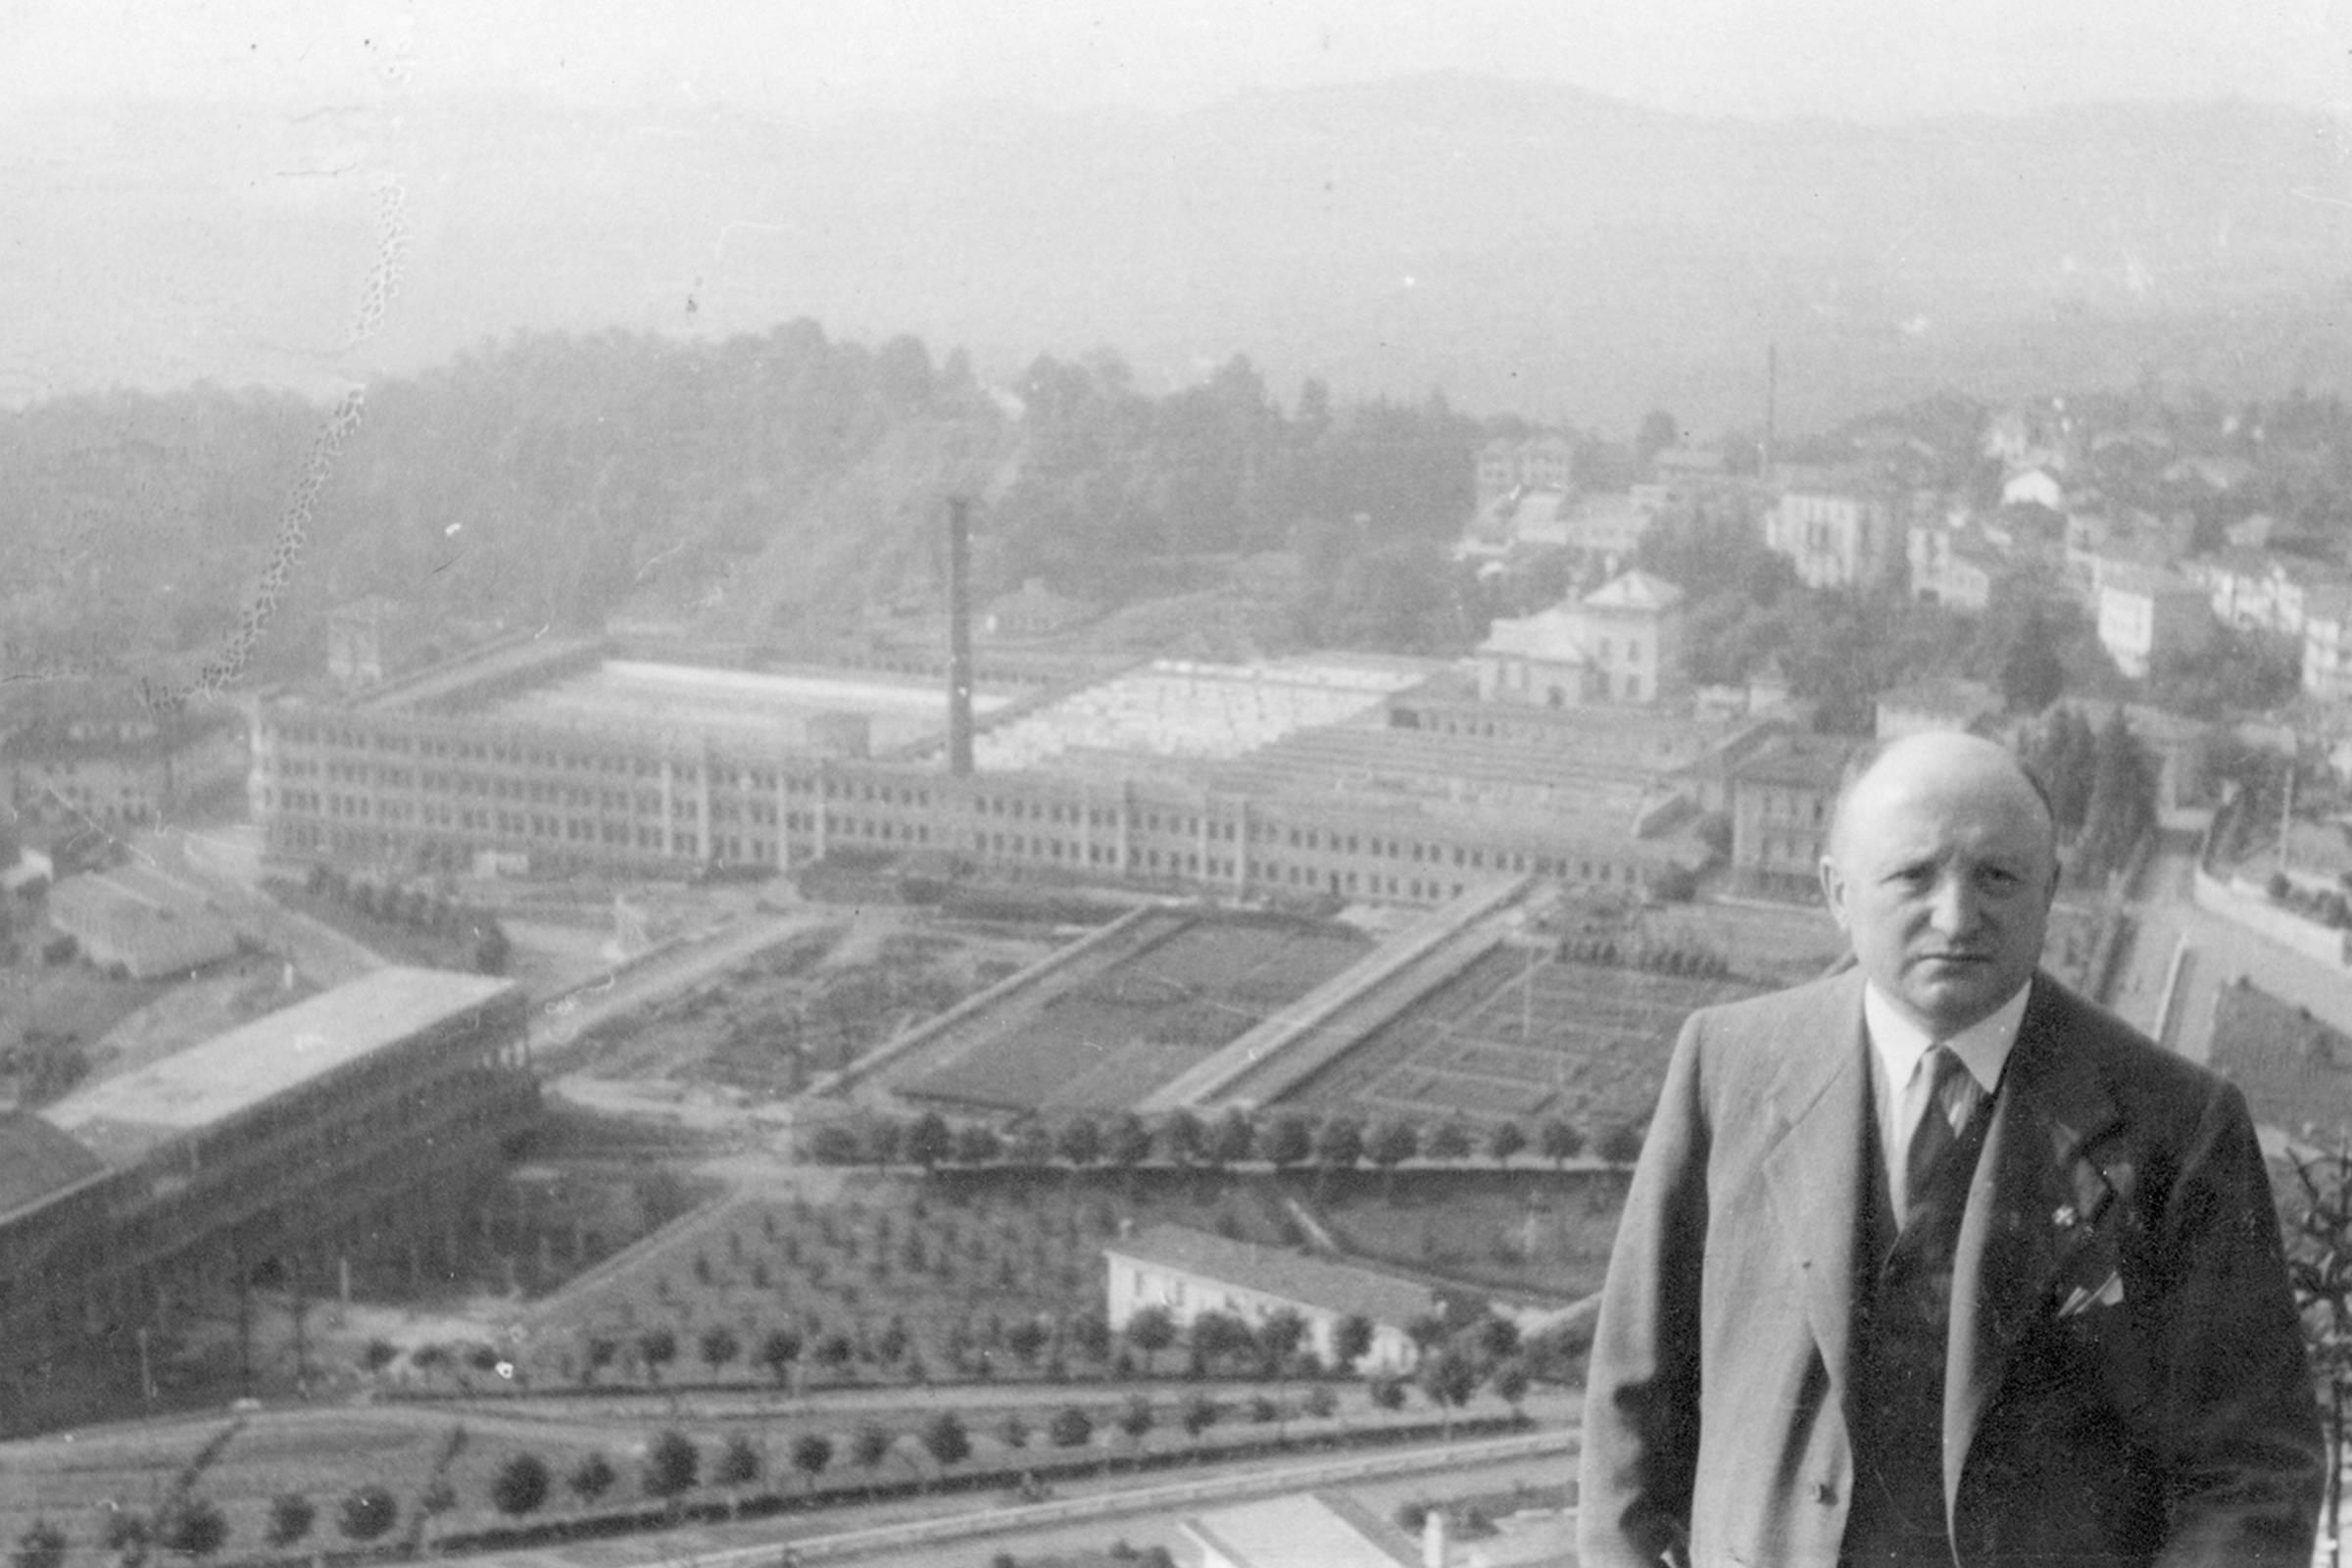 A Legacy of Thread: The Unrivaled Ermenegildo Zegna